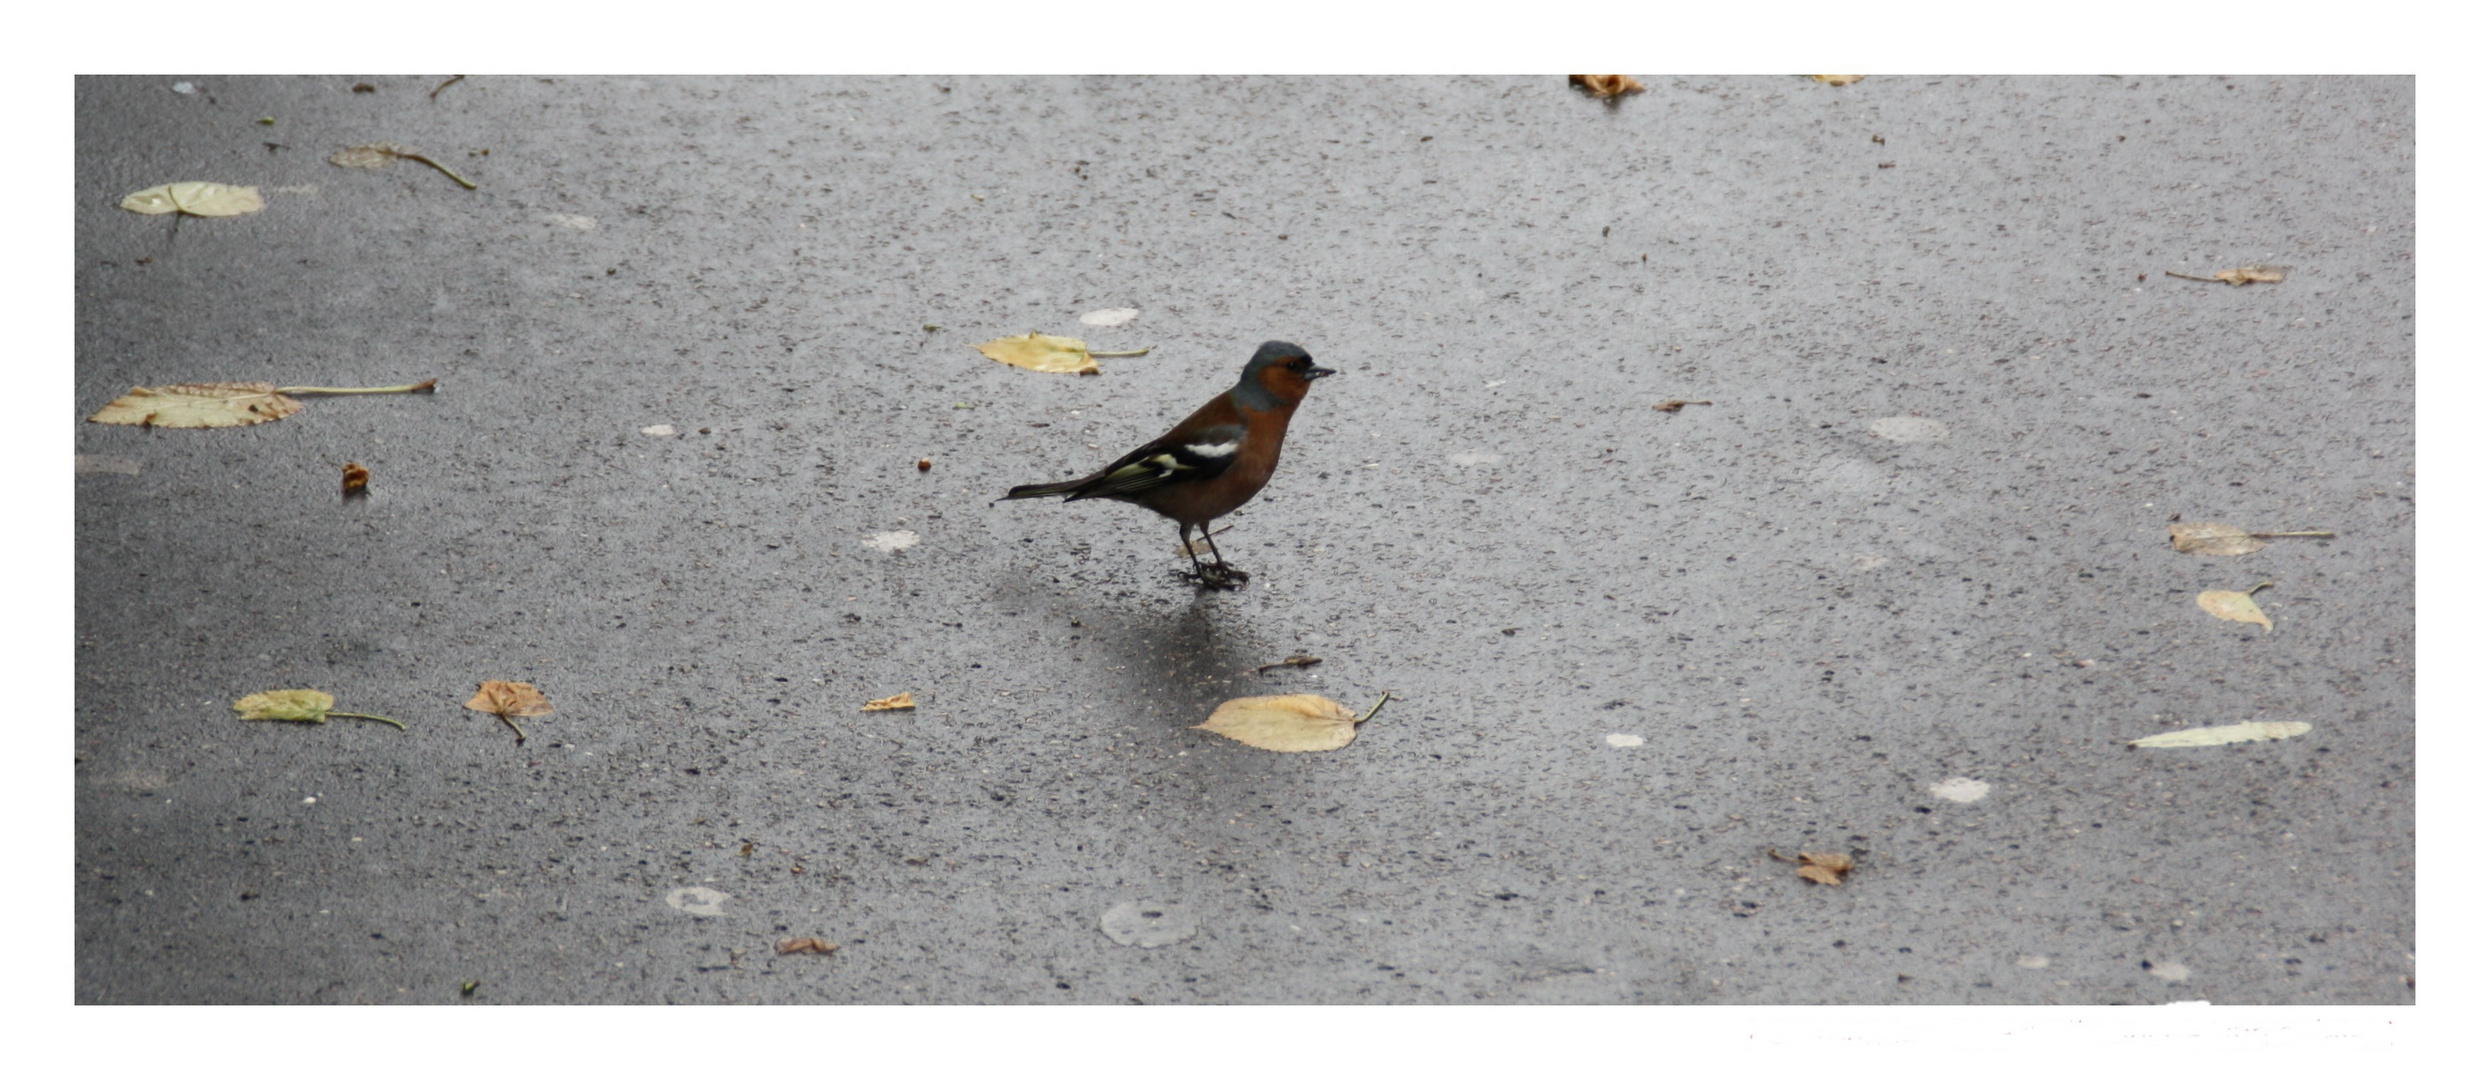 Le petit oiseau va sortir :)